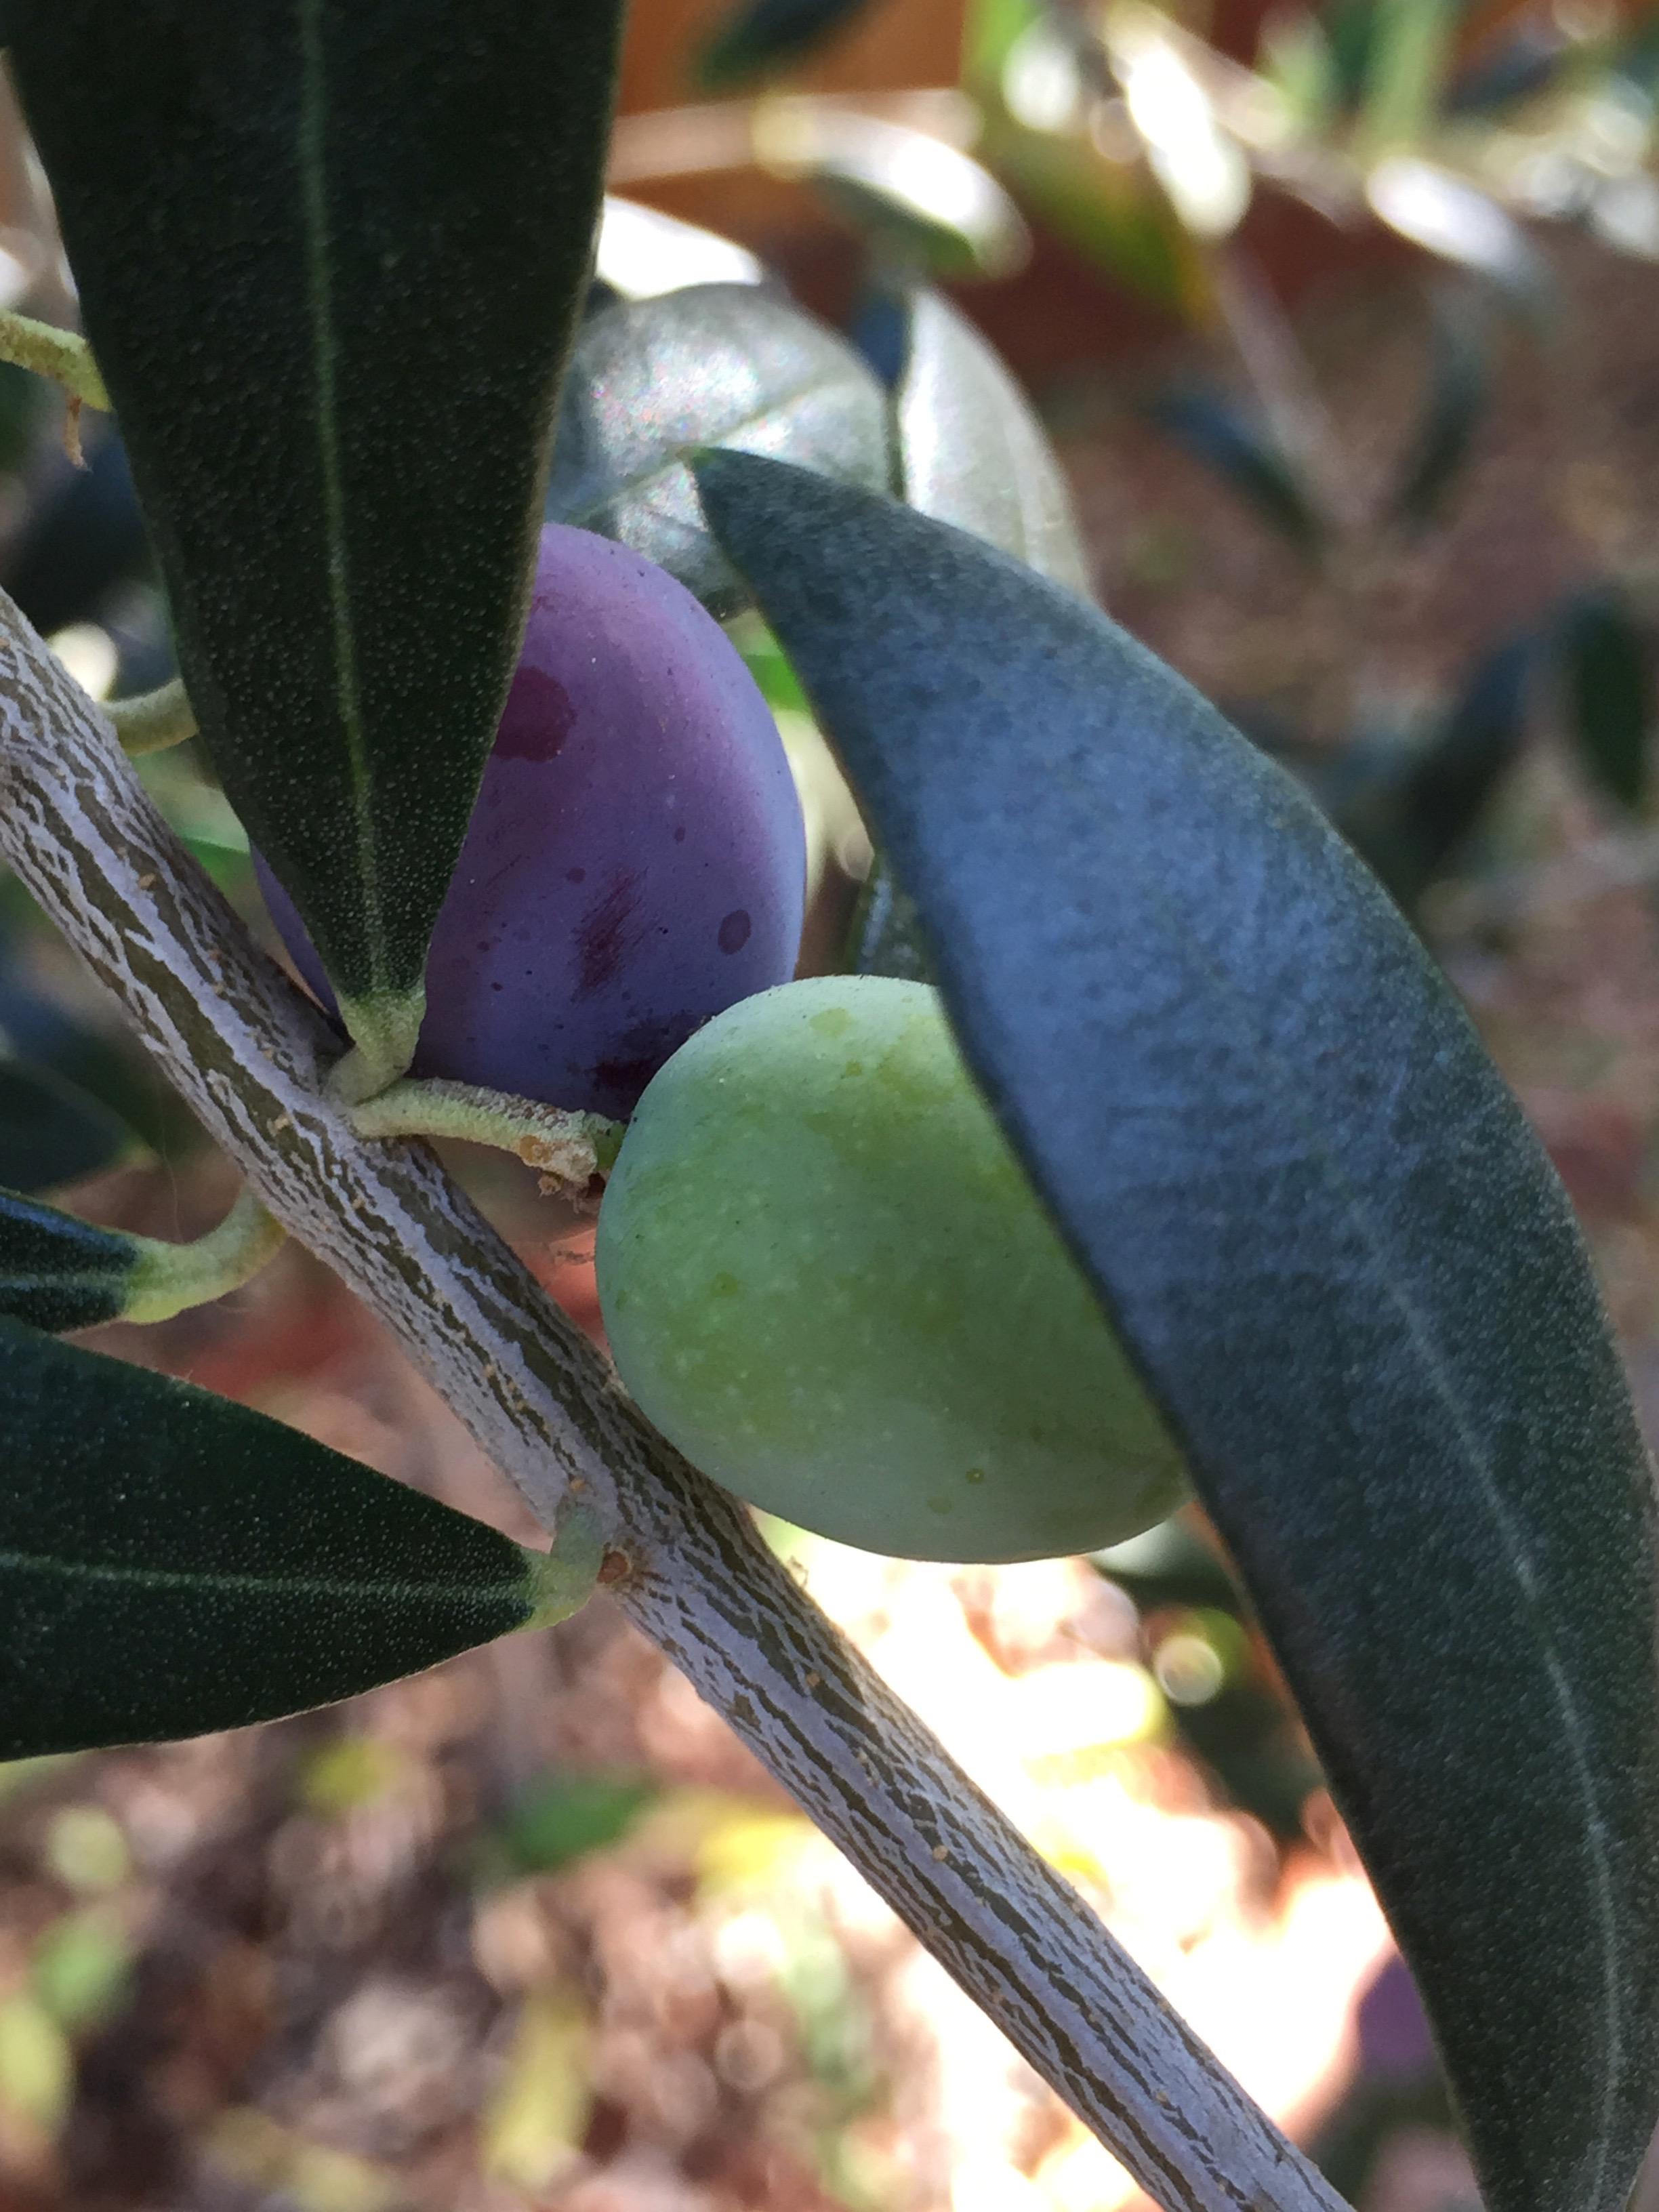 'Arbequina' olive